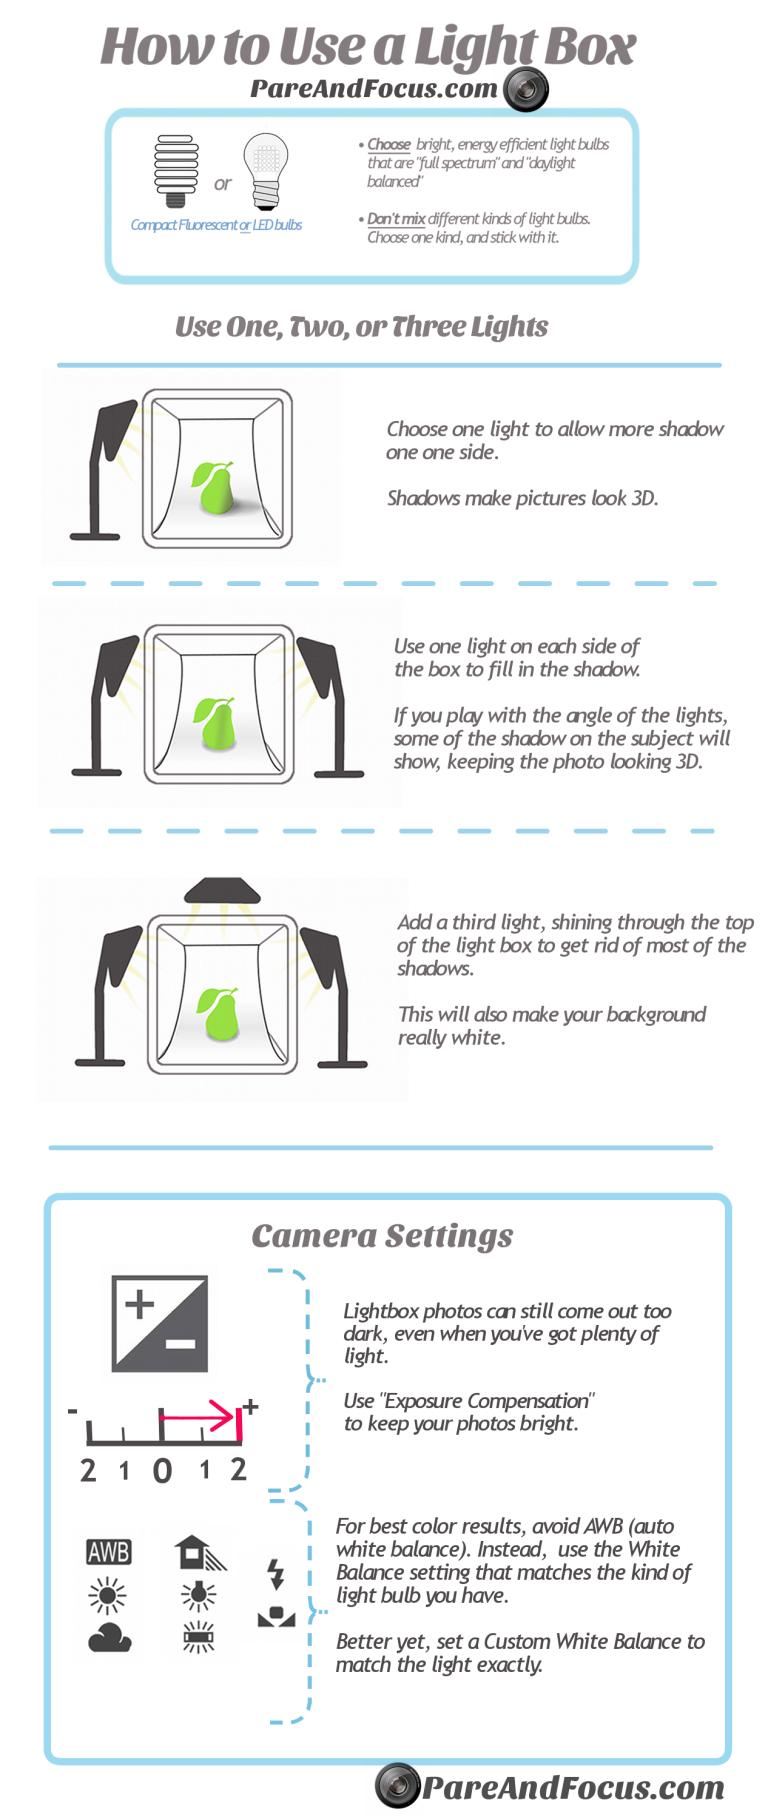 Algunos consejos sobre iluminación en fotografía #infografia #infographic #design